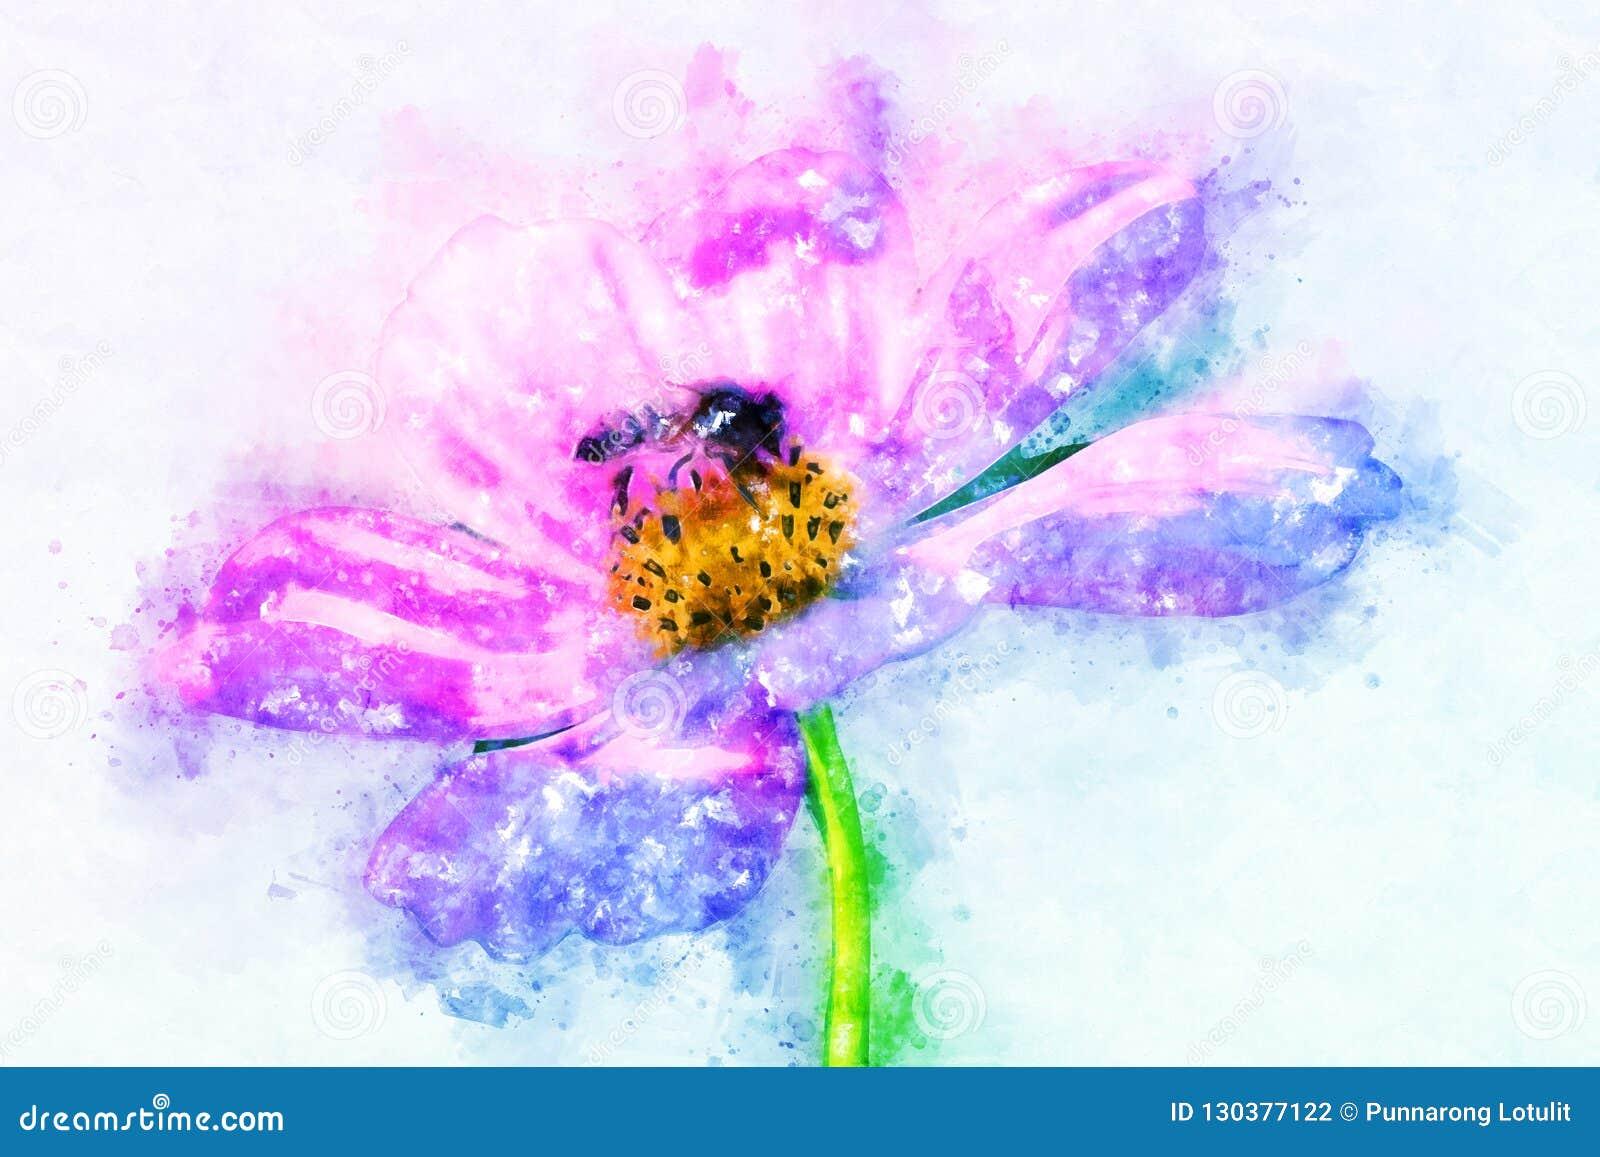 Flor abstrata que floresce no fundo colorido da pintura da aquarela